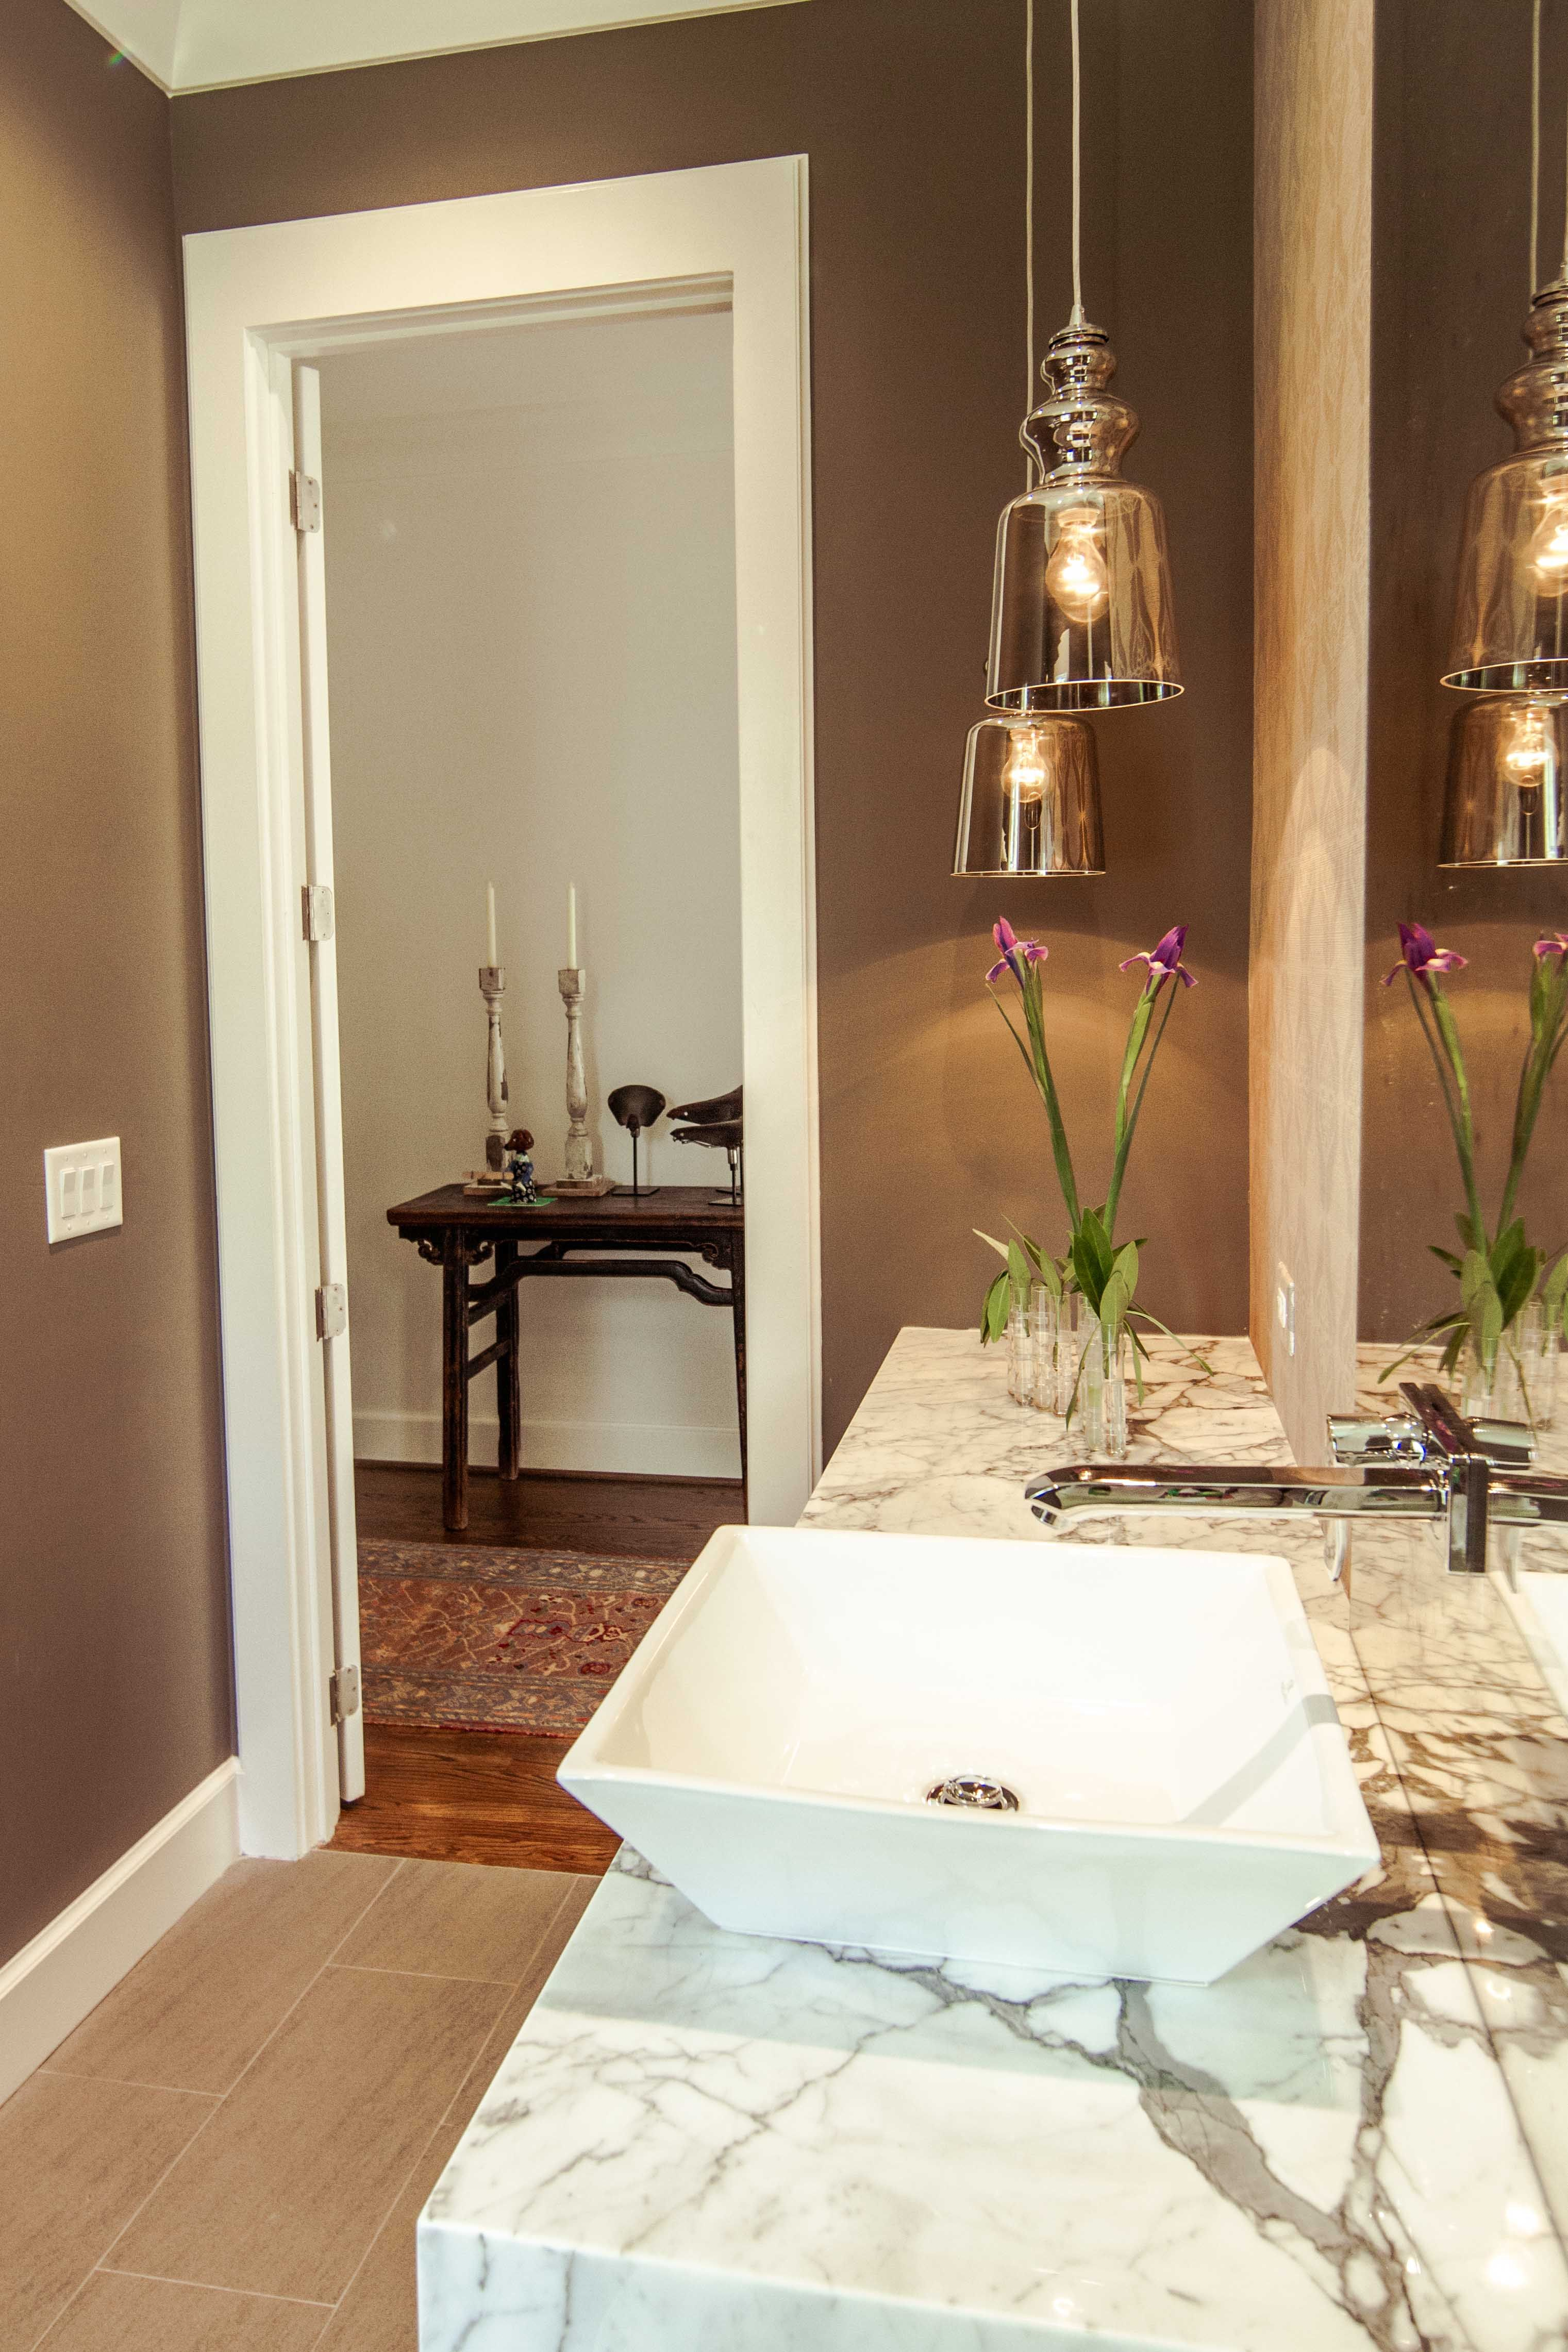 Hansgrohe Metris Wall-Mounted Faucet | bathroom | Pinterest | Wall ...